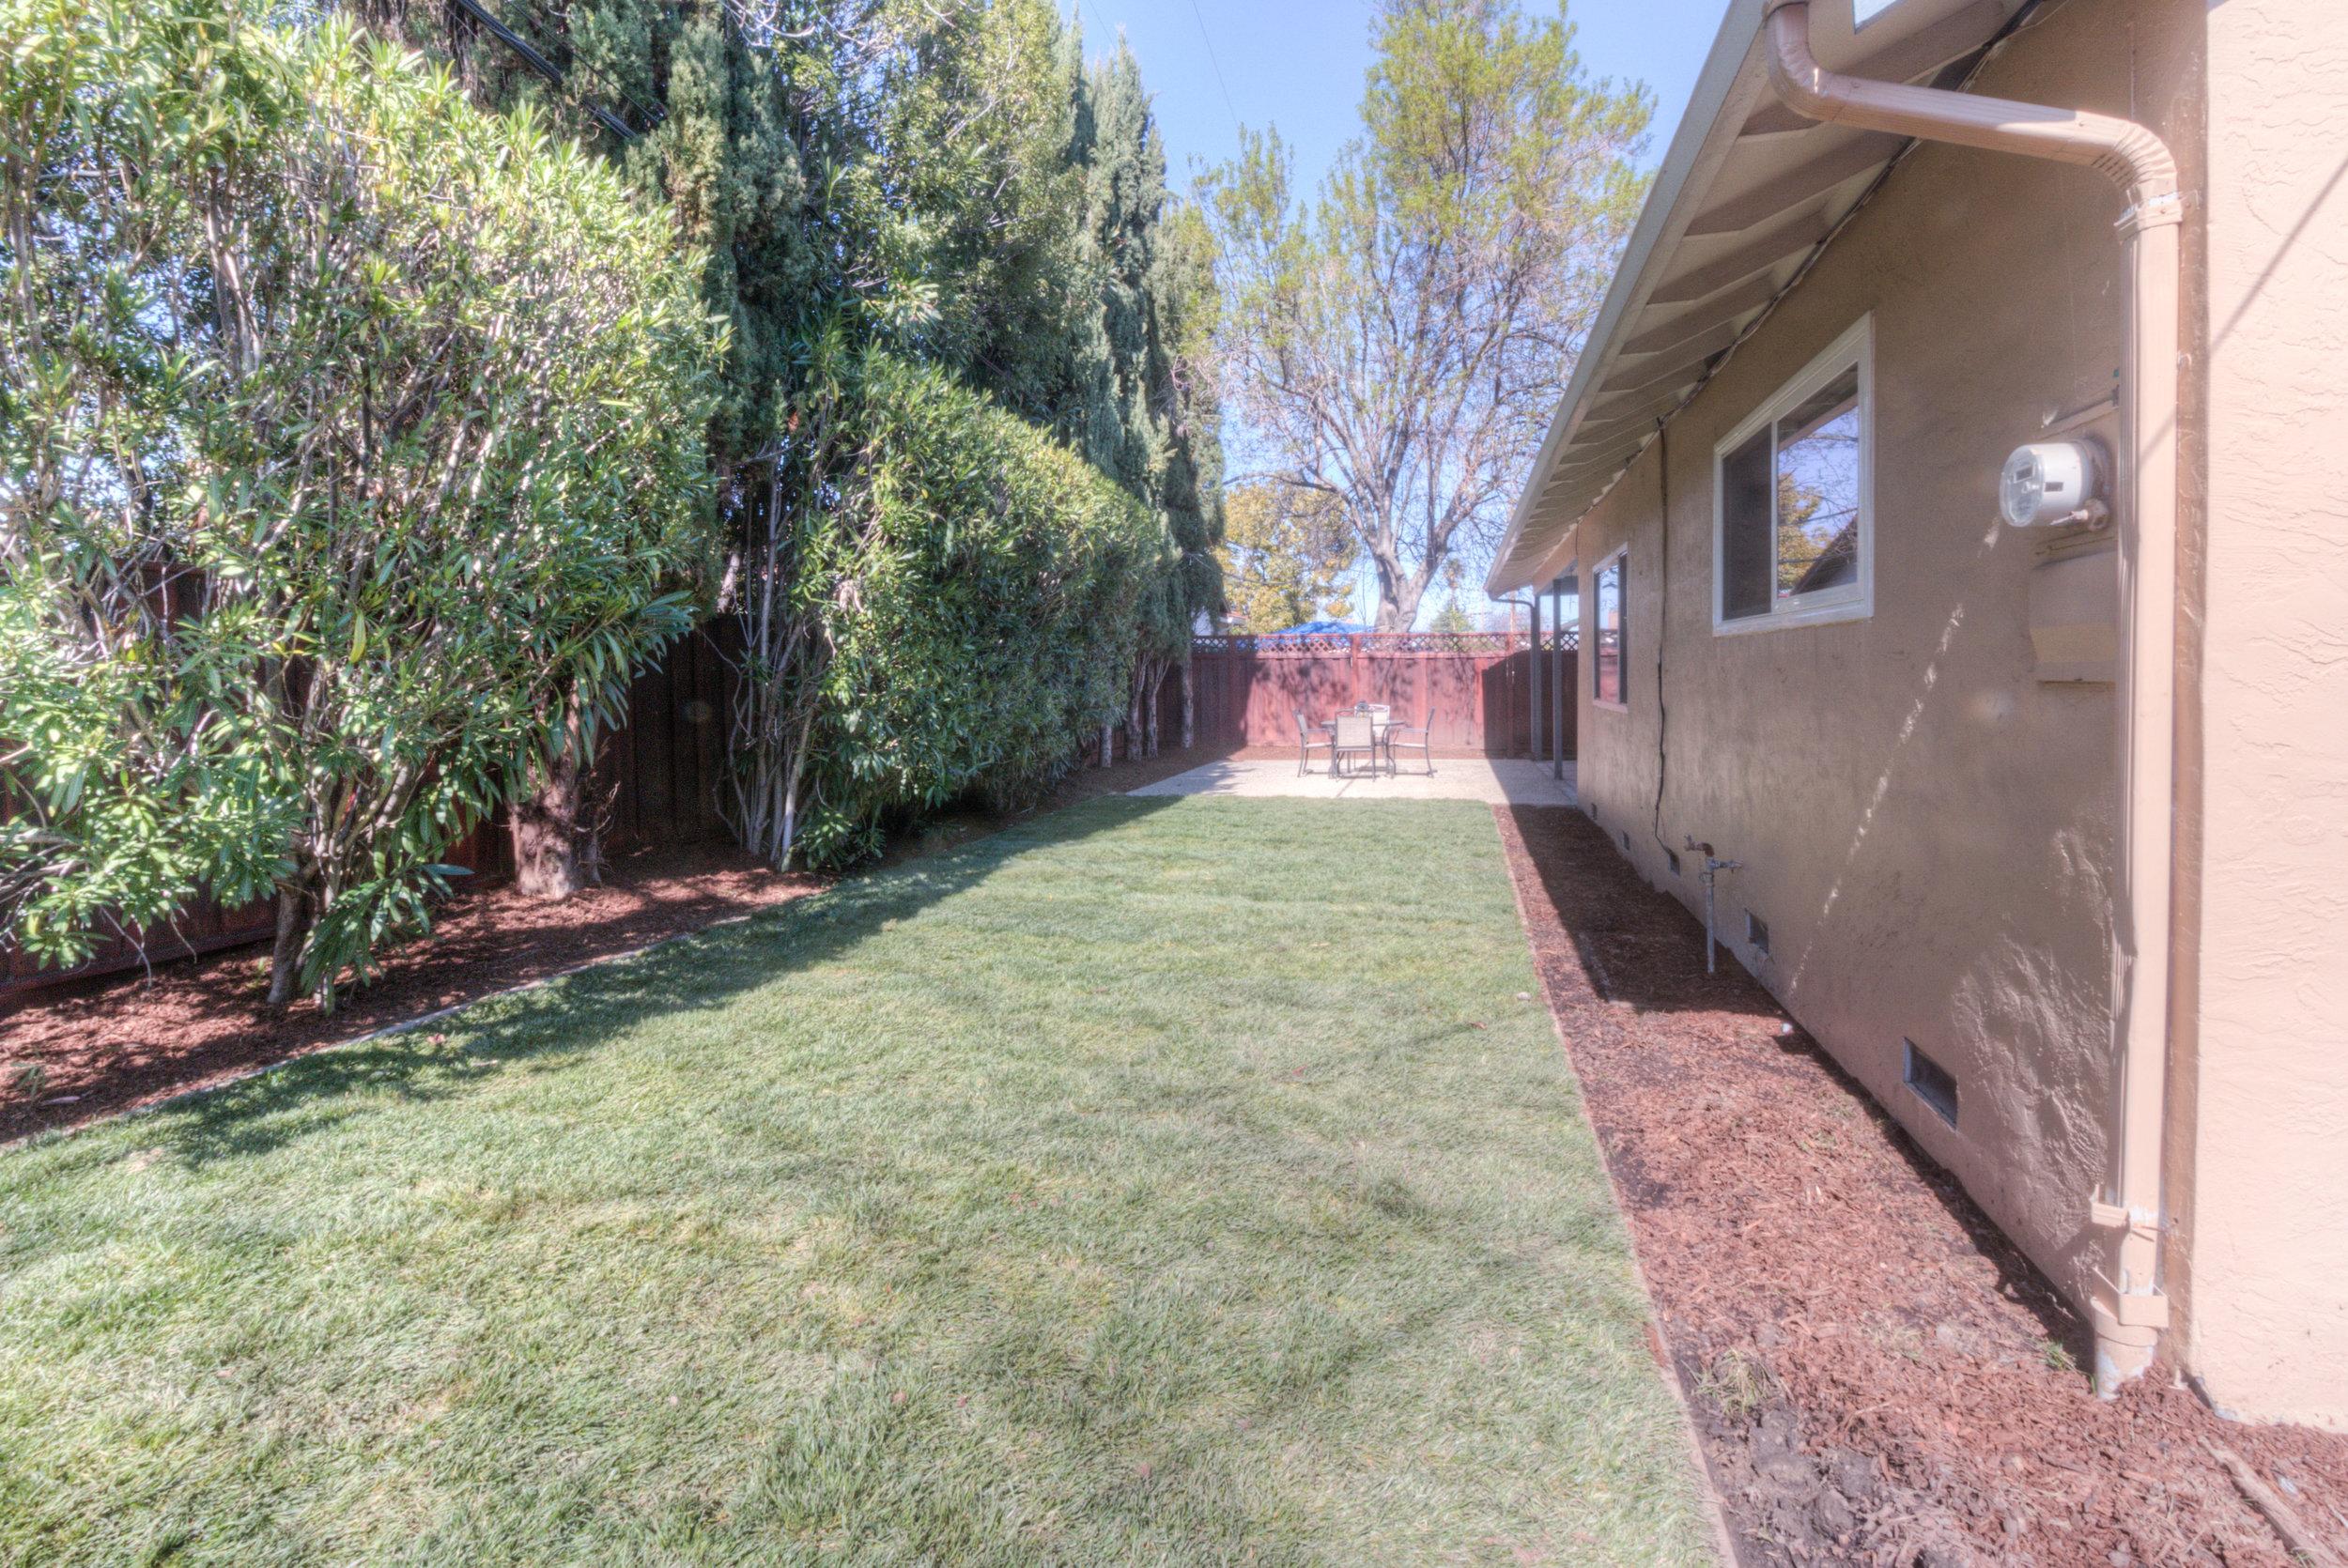 Mcgregor Backyard Revised-2.jpg